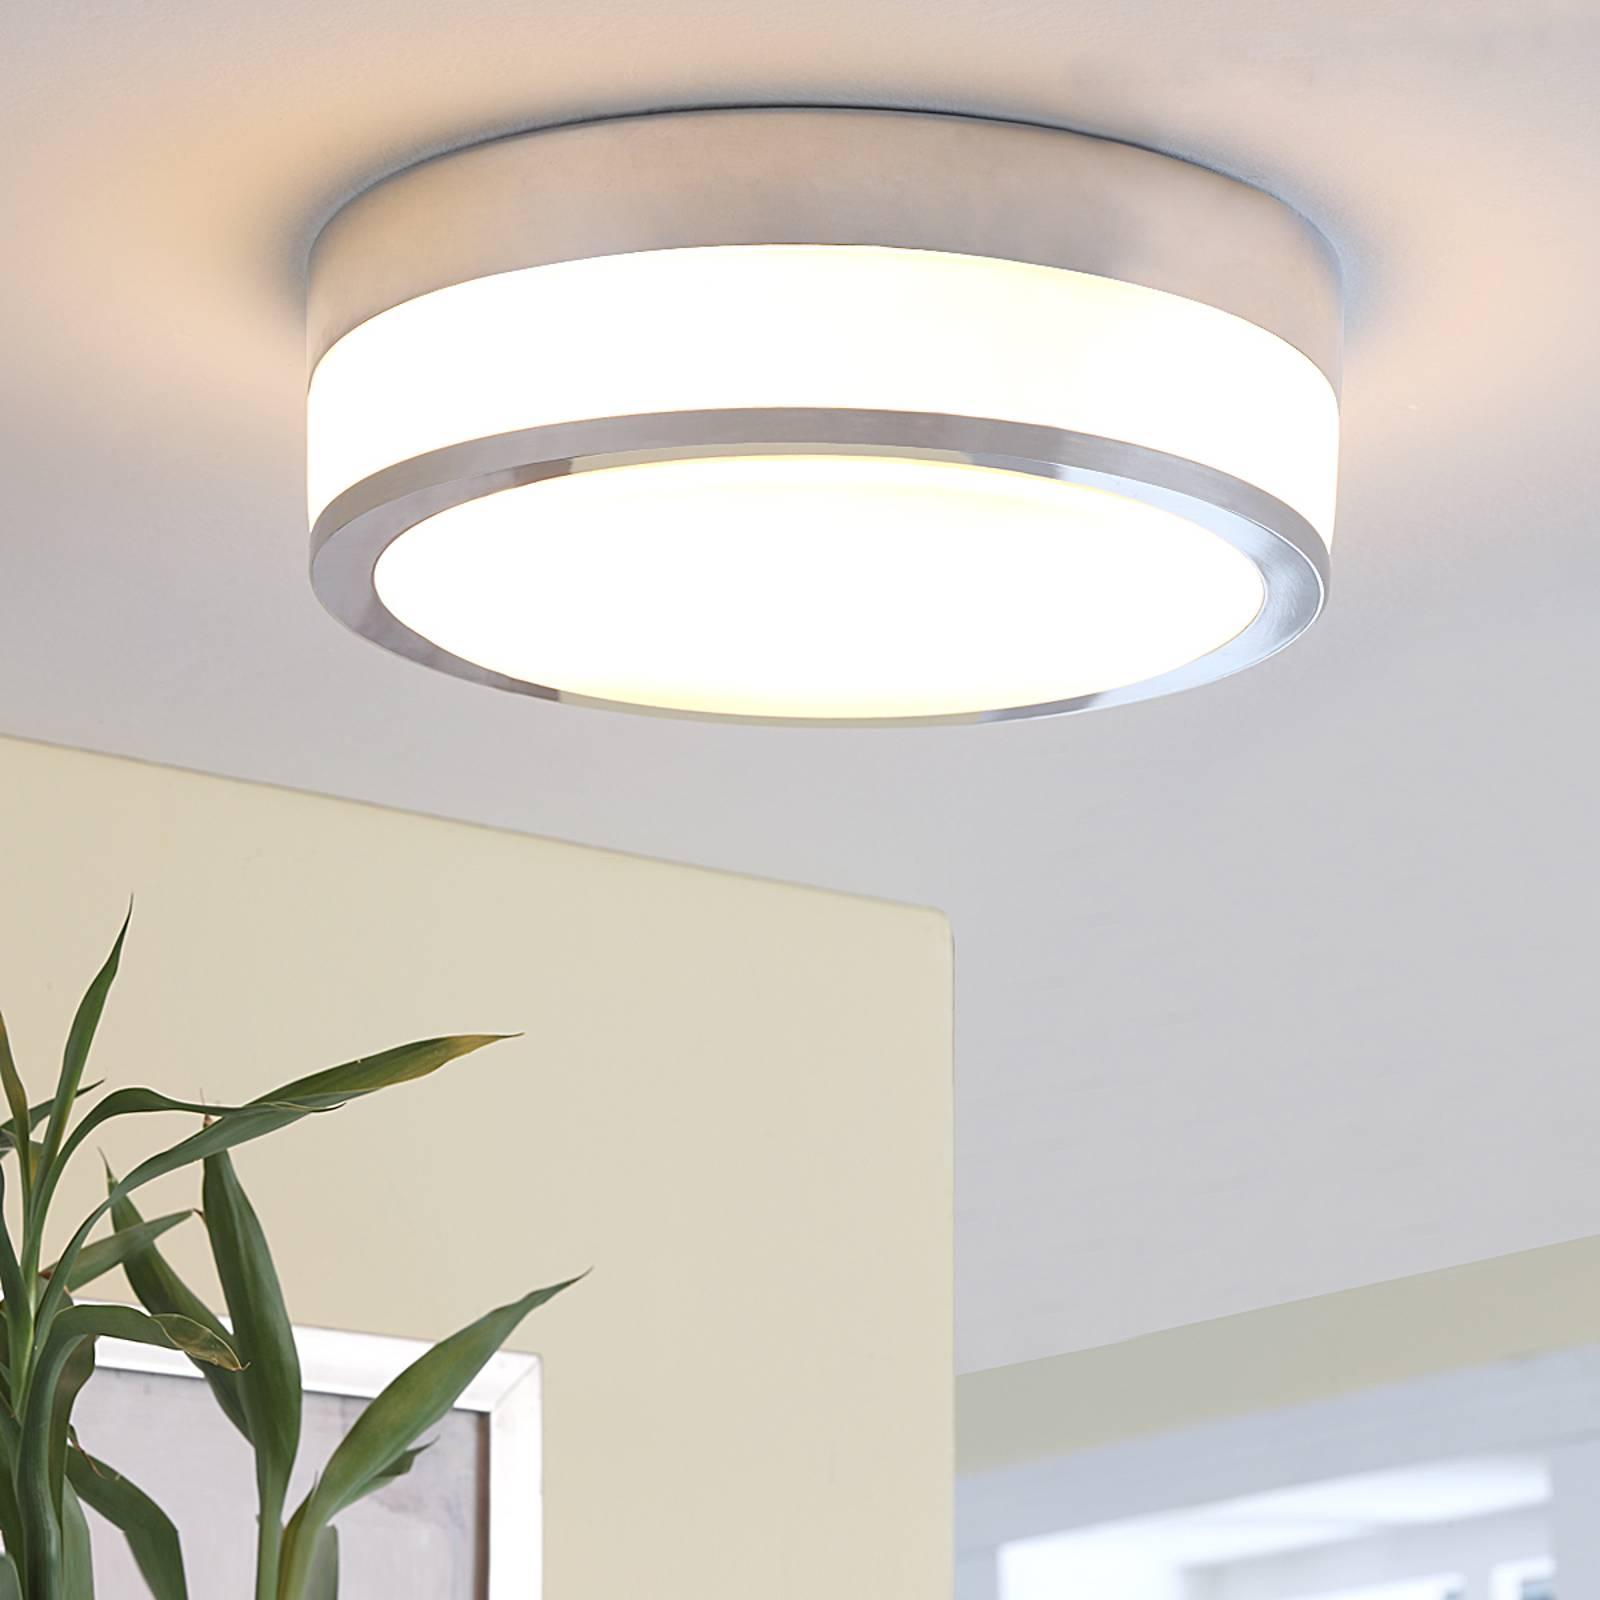 Plafondlamp Flavi voor de badkamer, E27 LED chroom